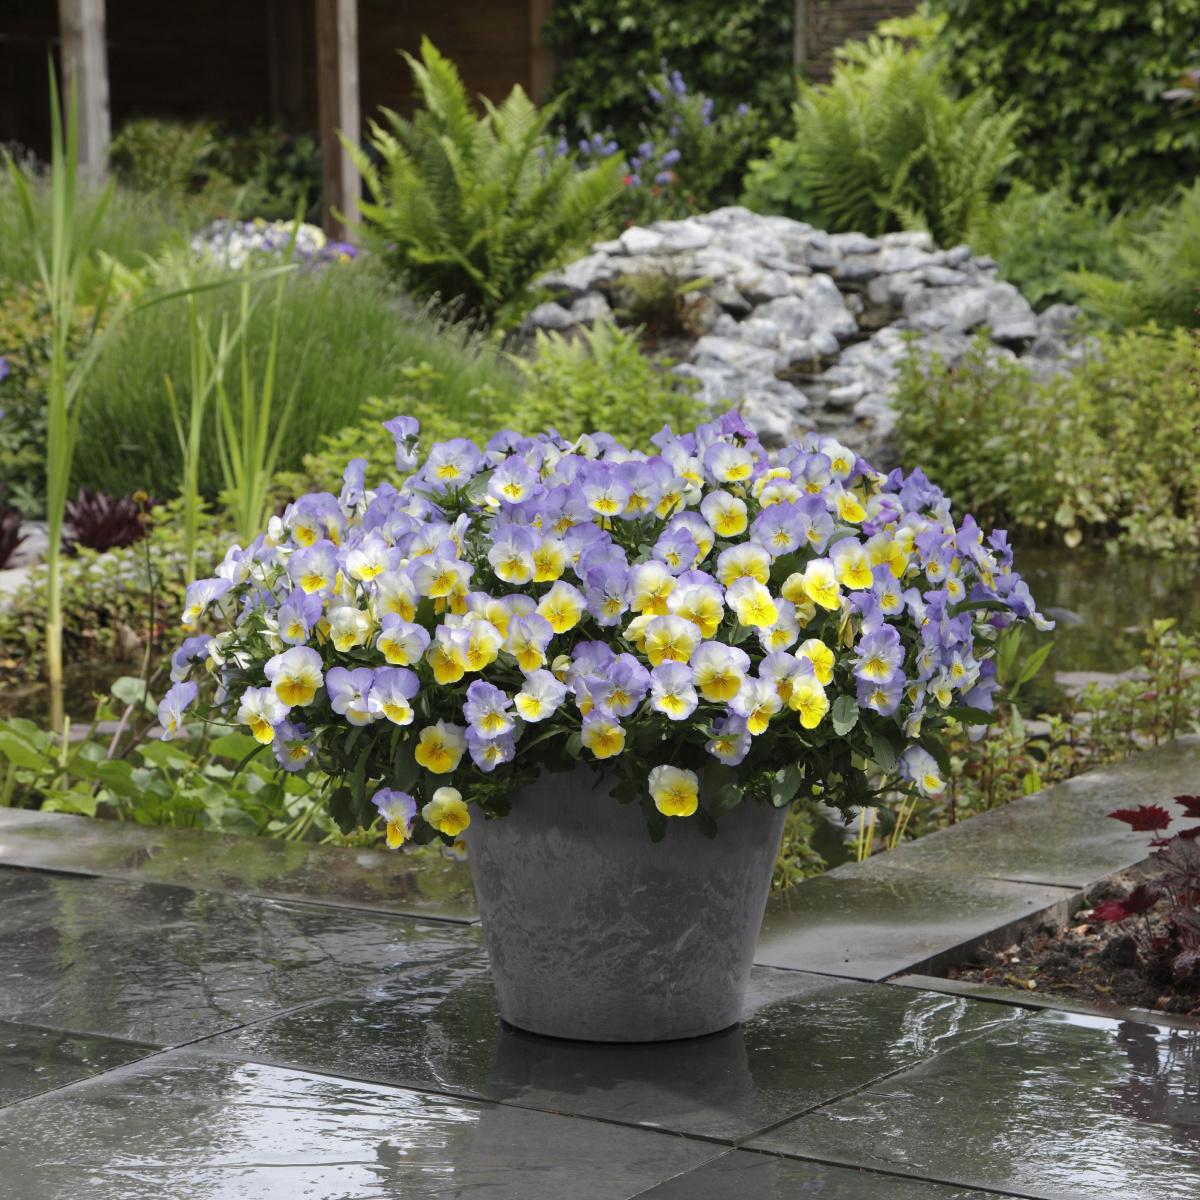 10 Container Gardening Ideas